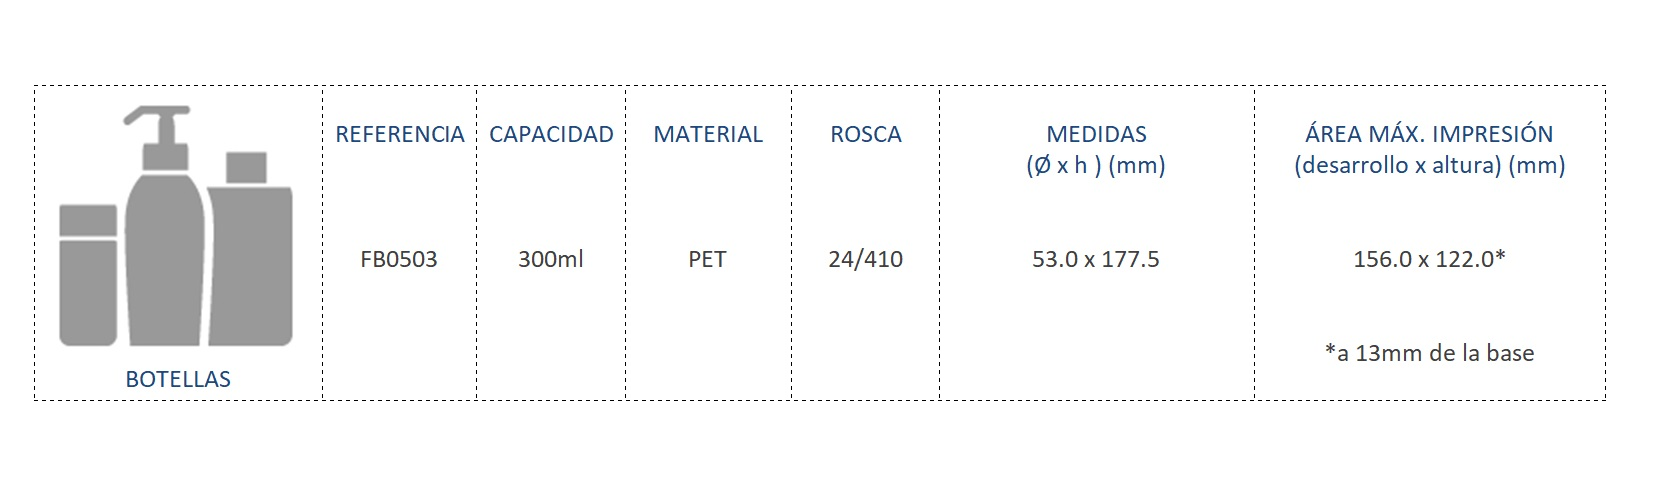 Cuadro de materiales FB0503